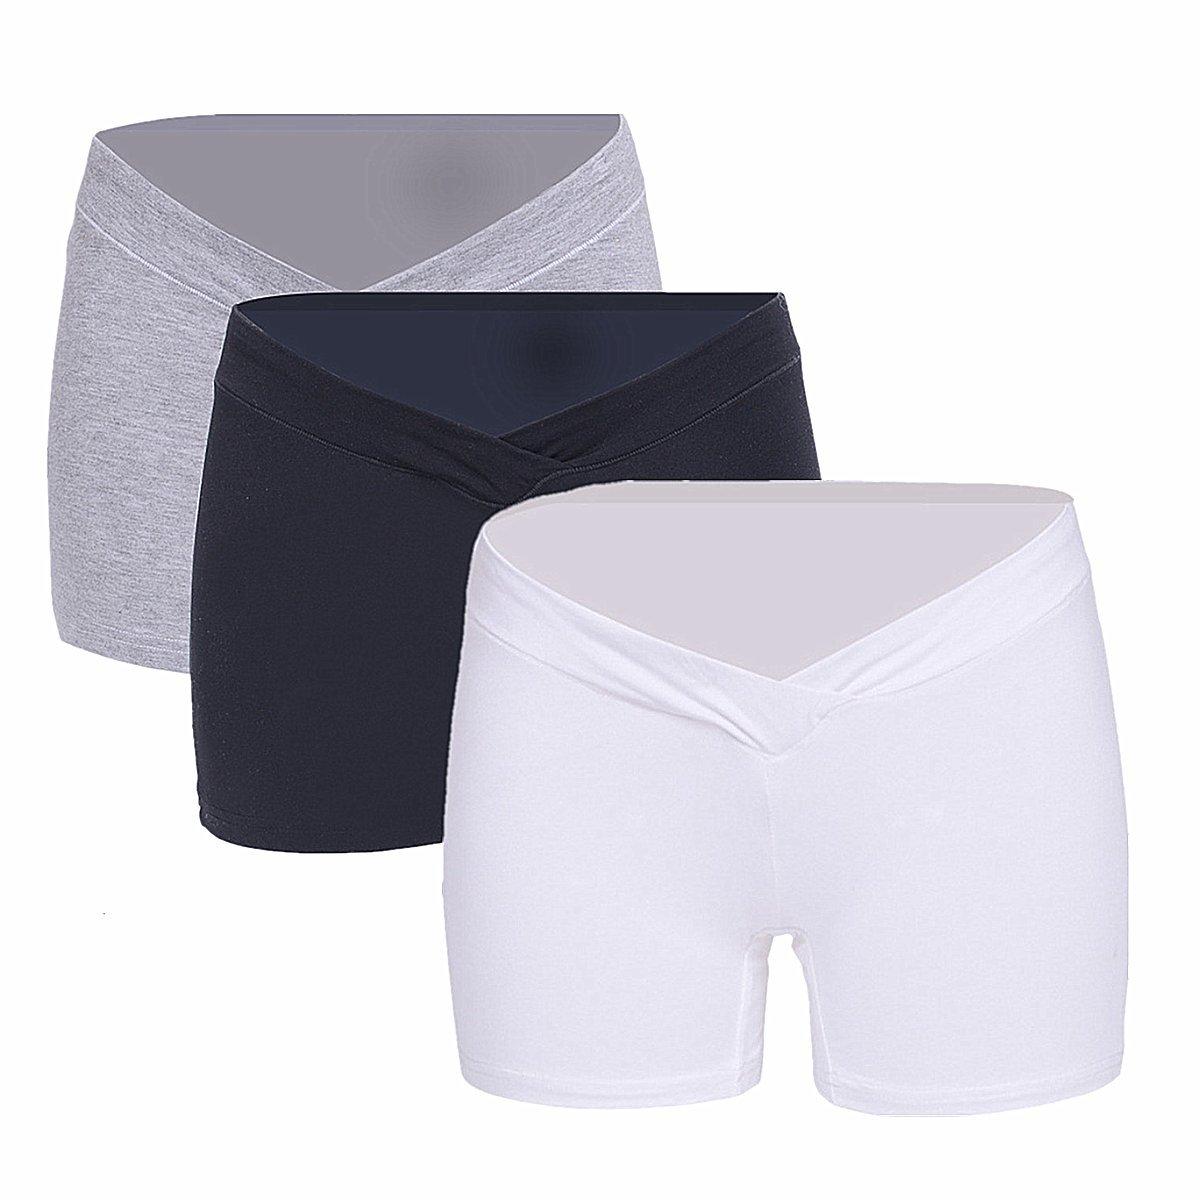 Maternity 3 Pcs Low Rise Cotton Bikini Brief Vary Colors Black White Grey XL